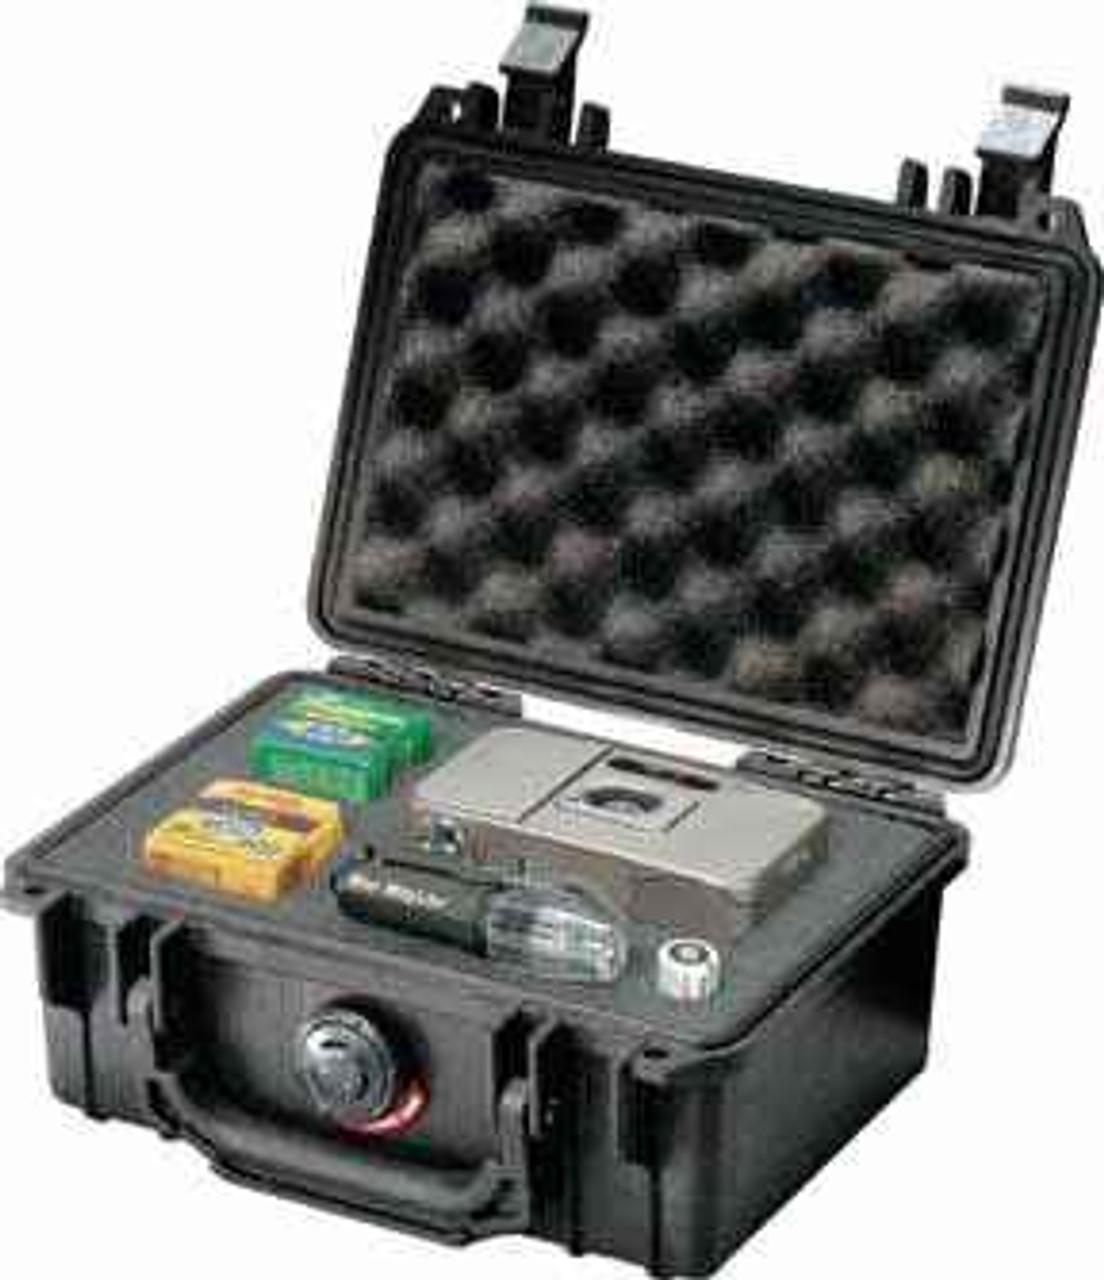 "Pelican Protector Case. Interior measurement 7 3/8"" x 4 7/8"" x 3 1/16""."